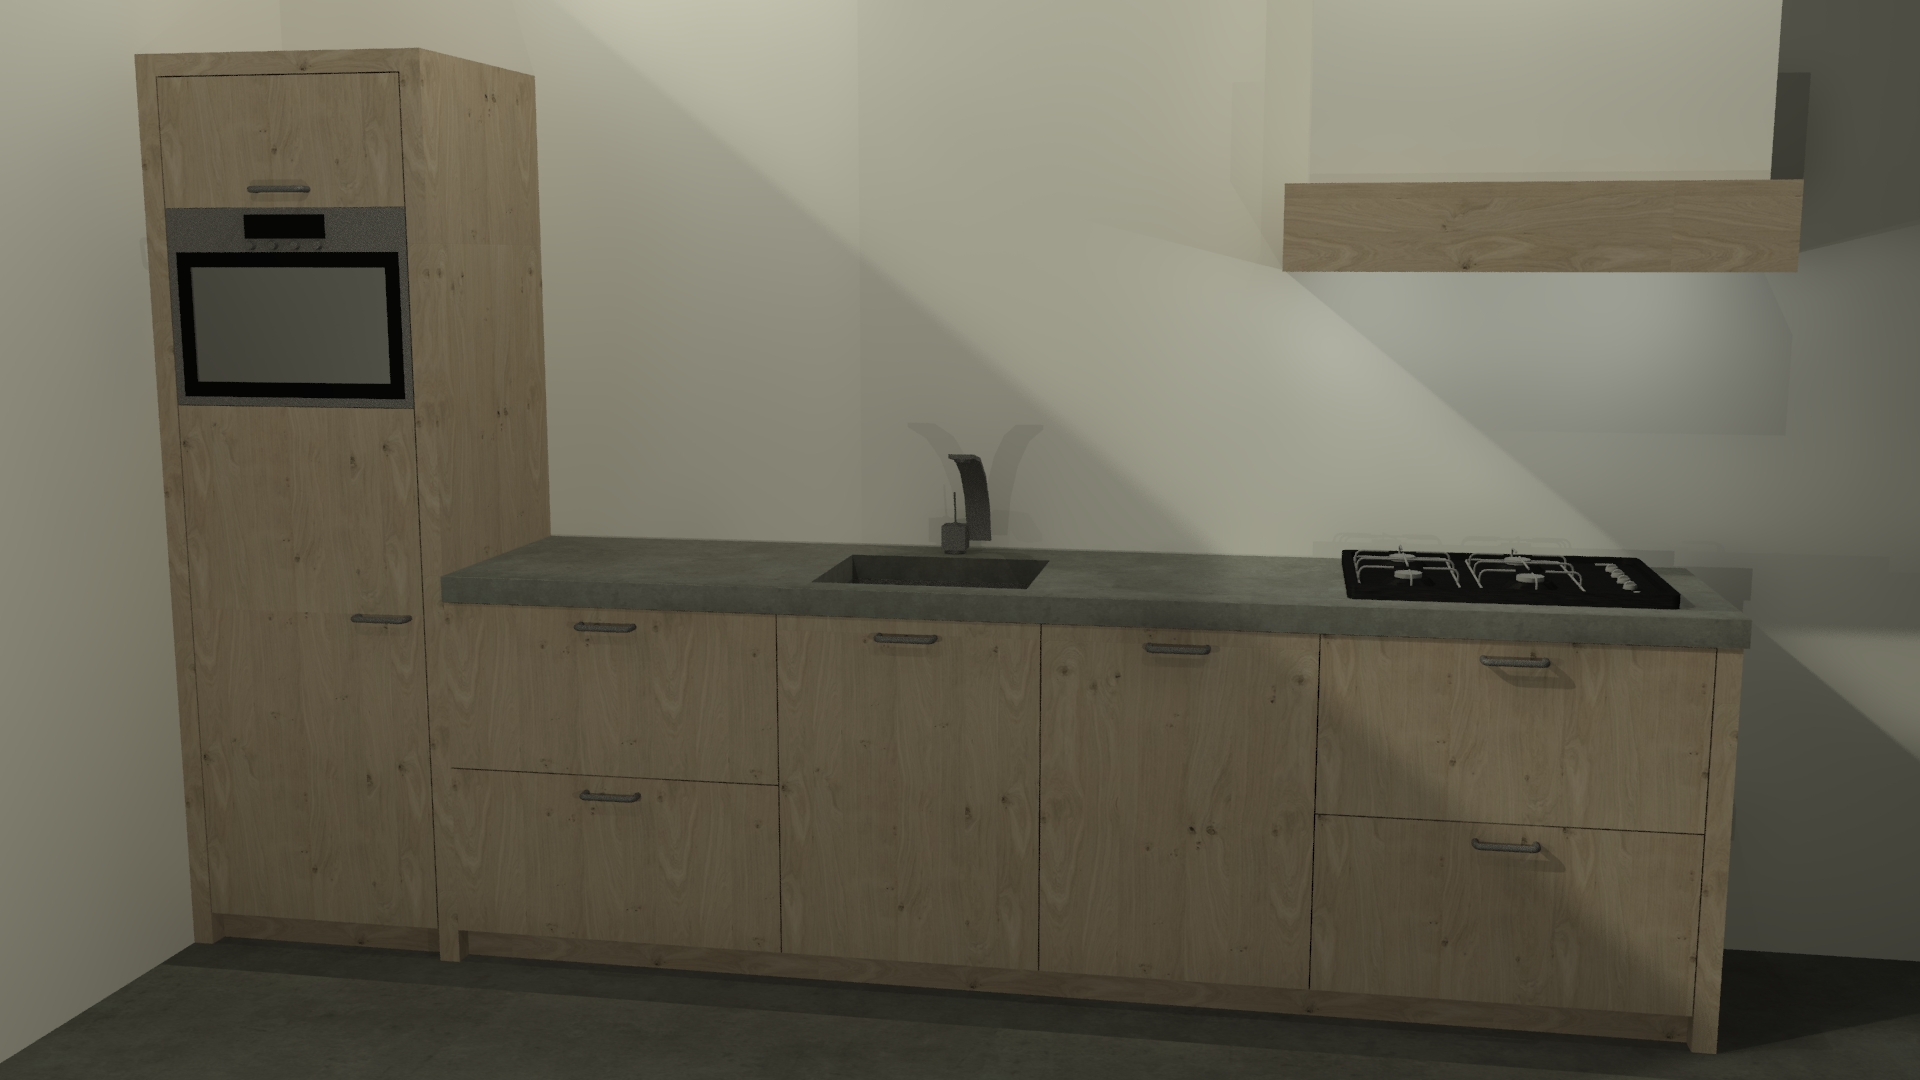 3.Keuken klein